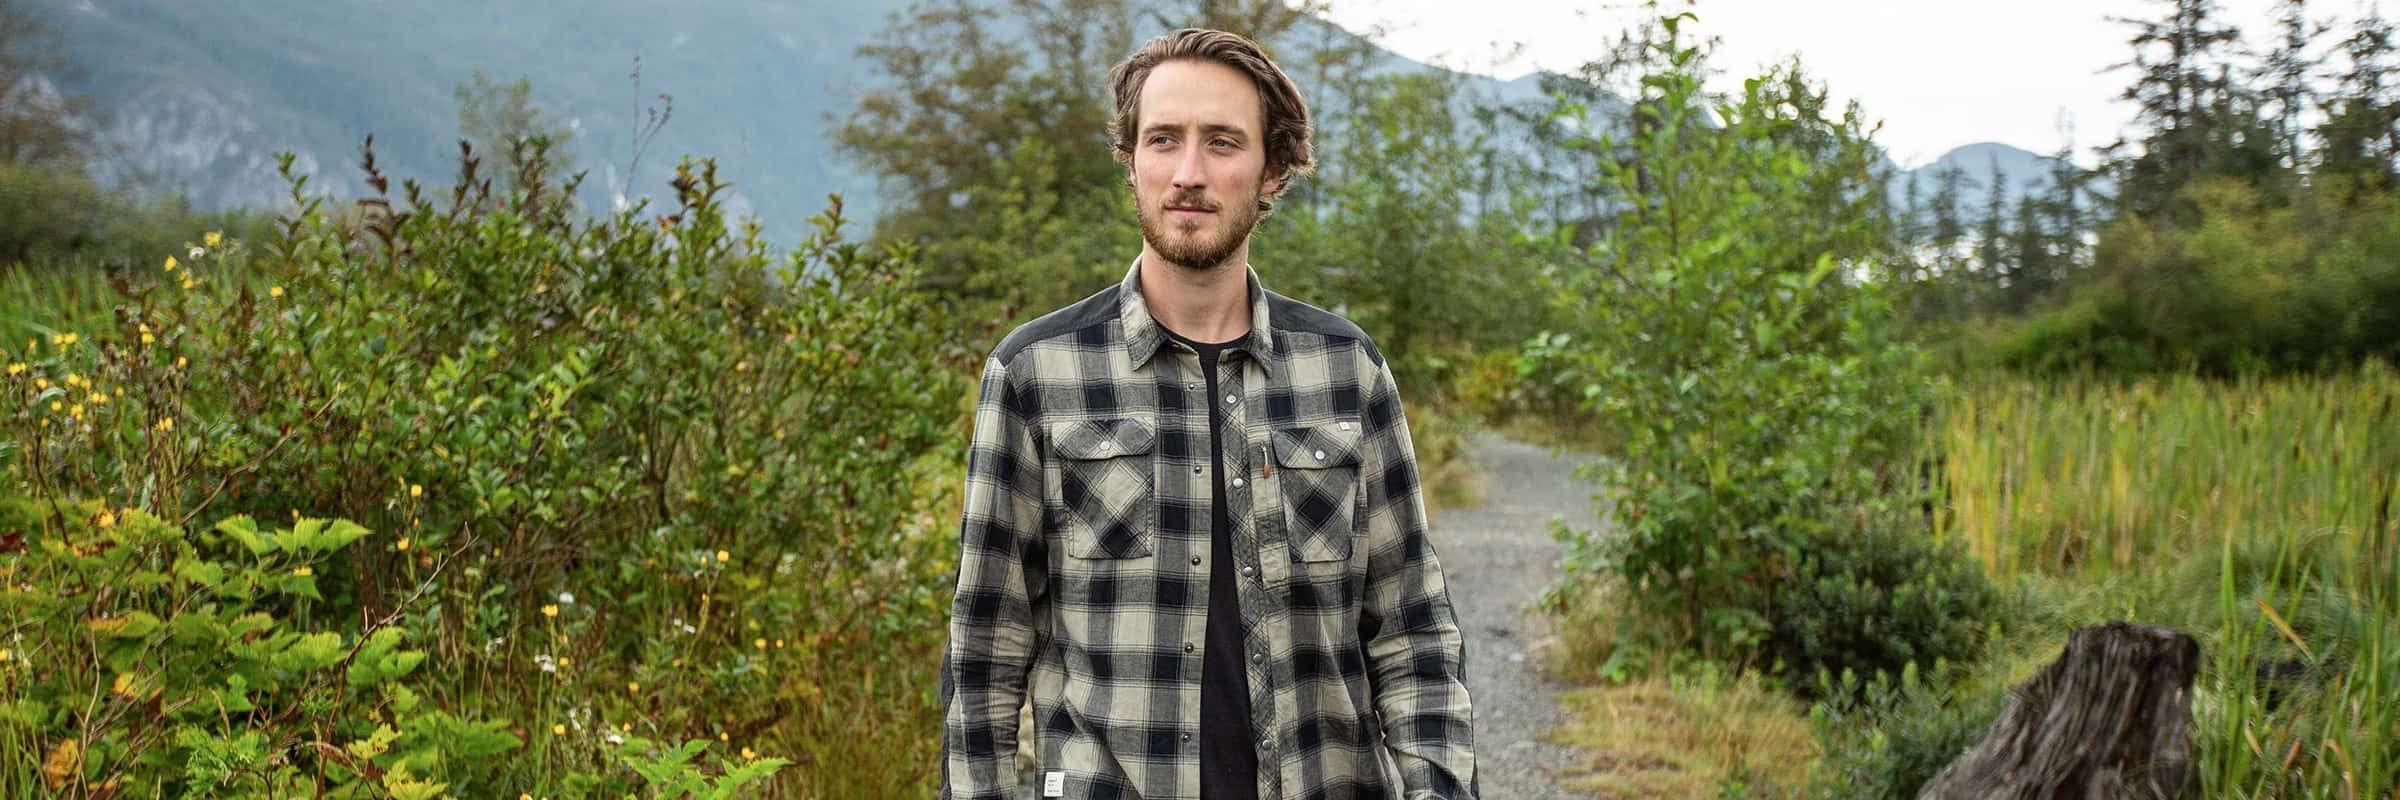 Norrona. Norrøna Svalbard Flannel Shirt Reviewed